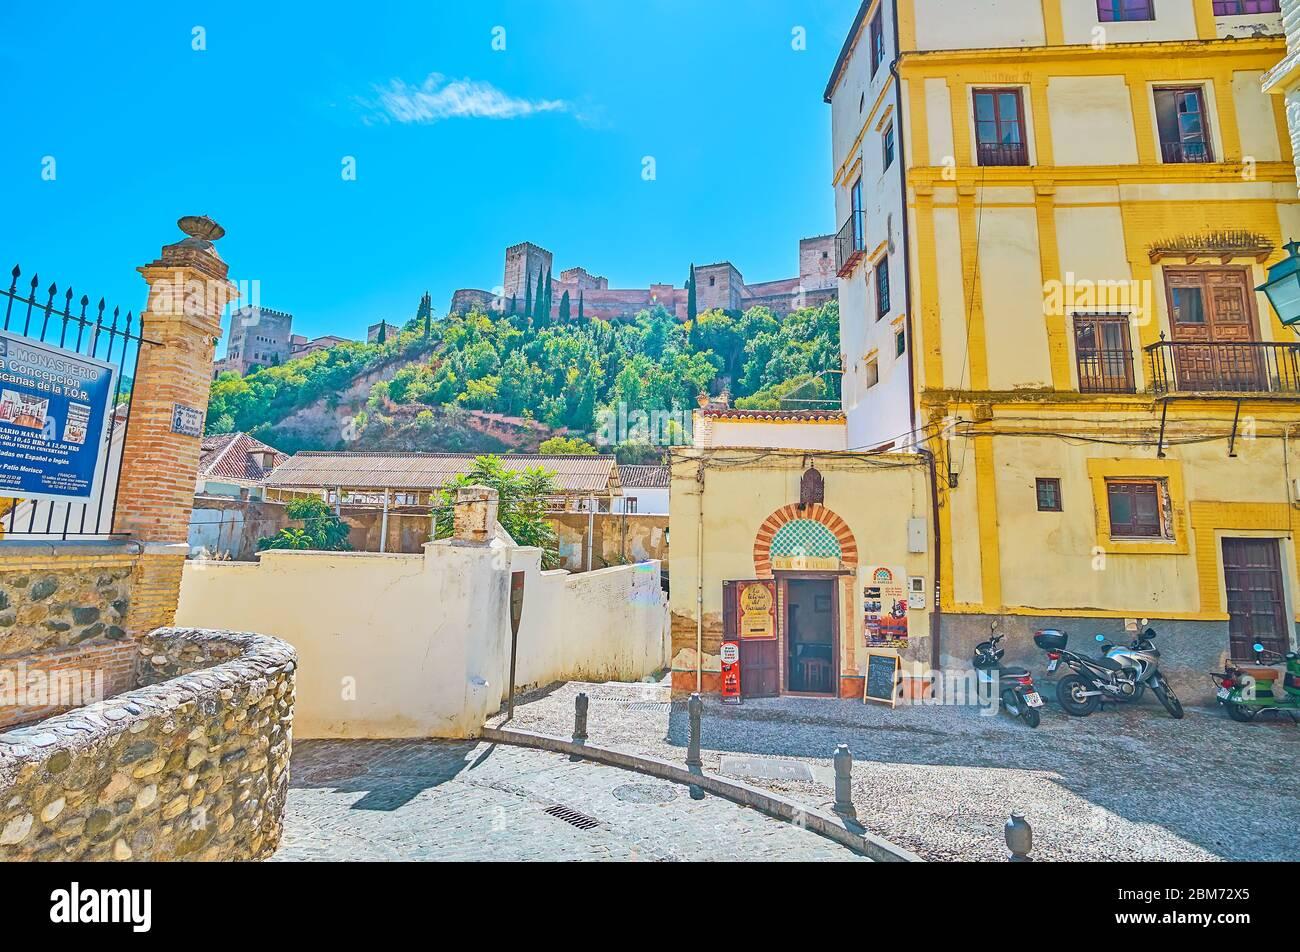 GRANADA, SPAIN - SEPTEMBER 25, 2019: Tiny Plazeta de la Concepcion square with medieval house of Teteria El Banuelo cafe and a view on Sabika hill, to Stock Photo